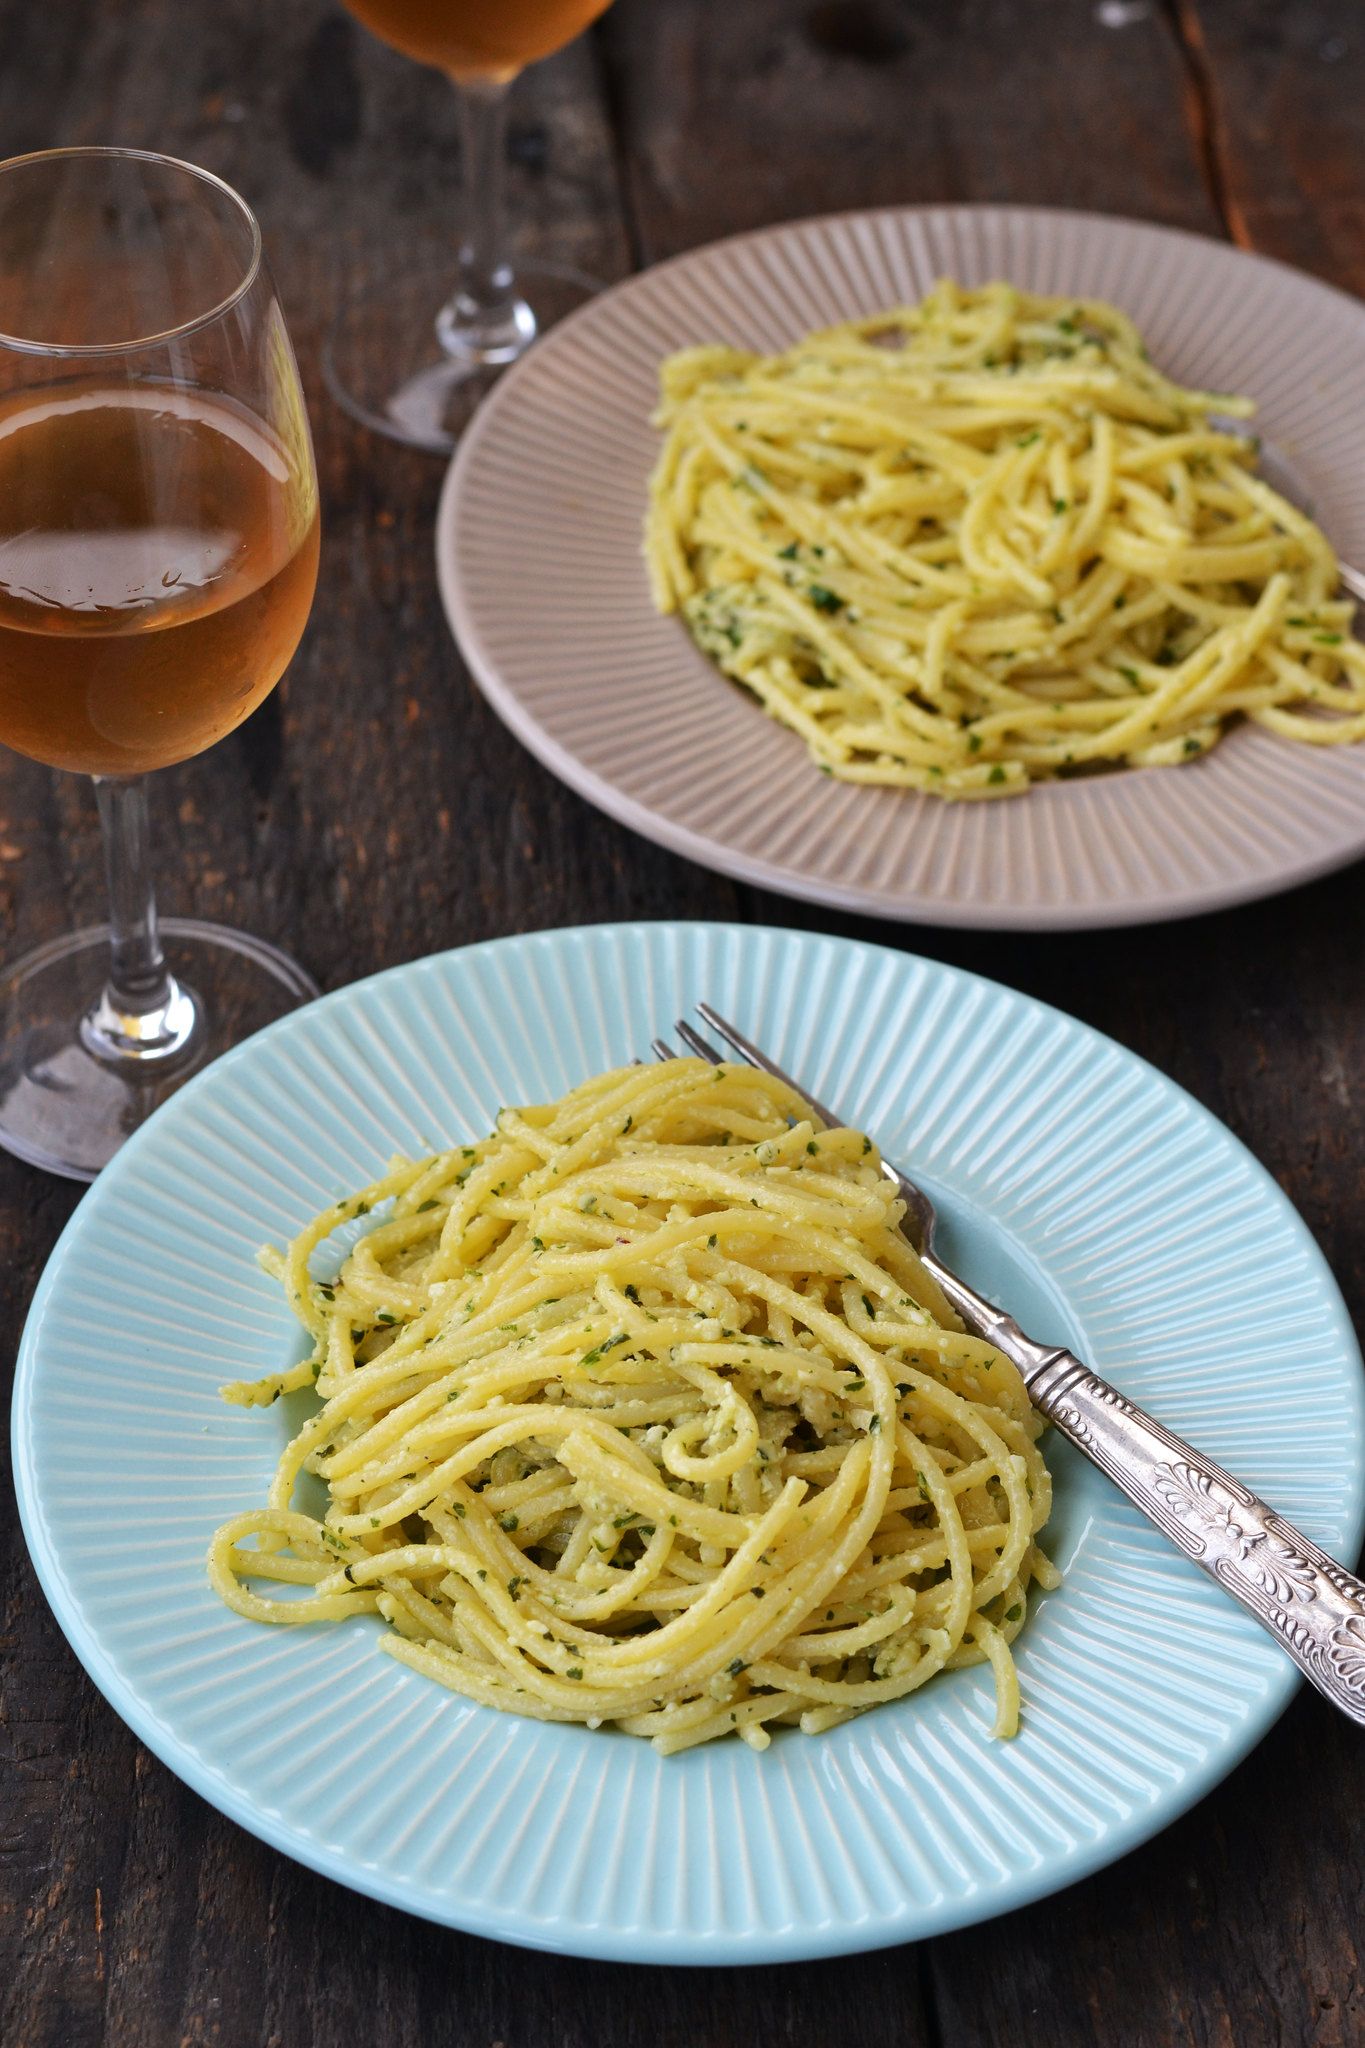 spaghetii fara gluten